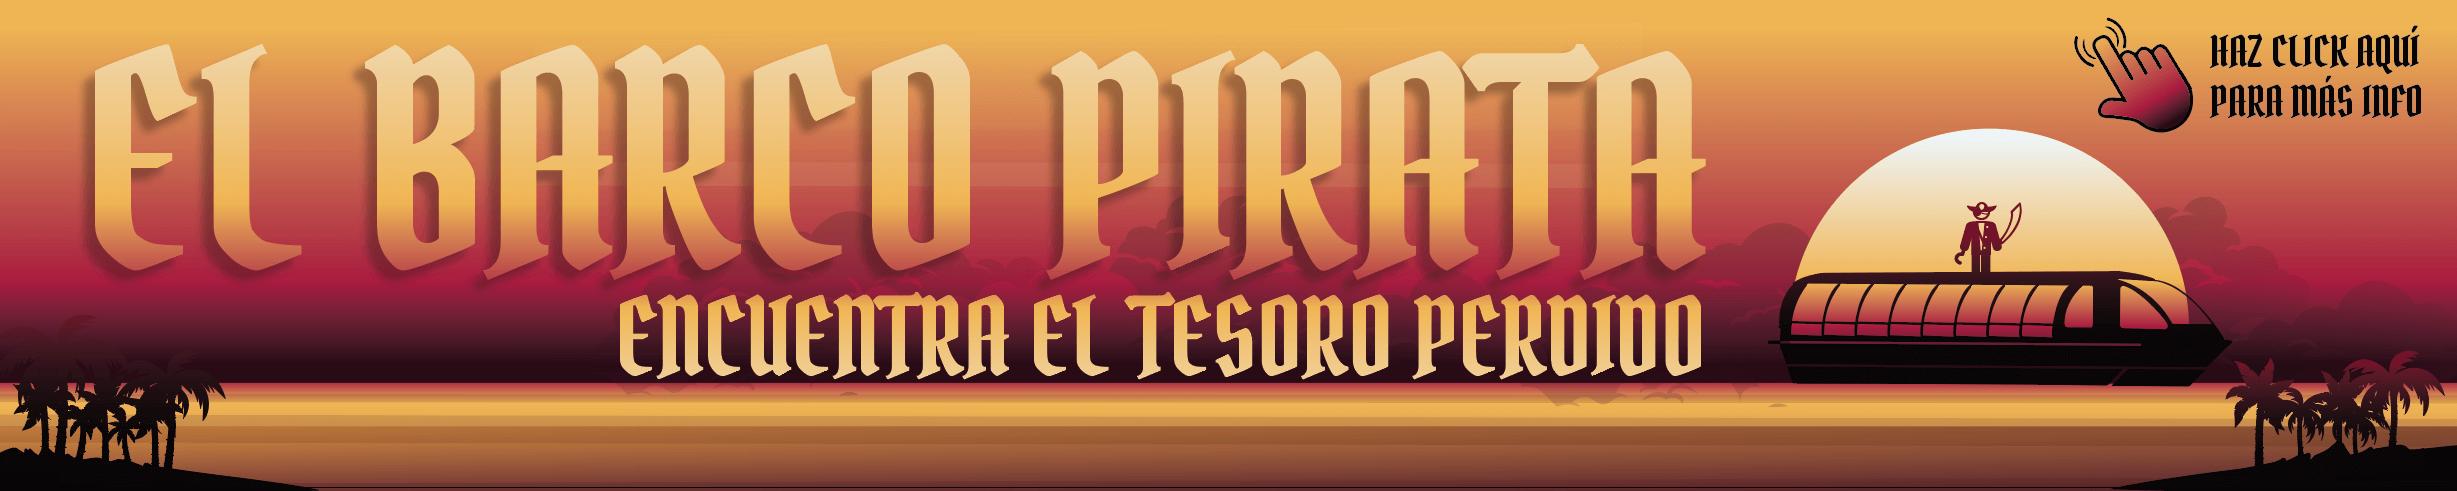 banner barco pirata